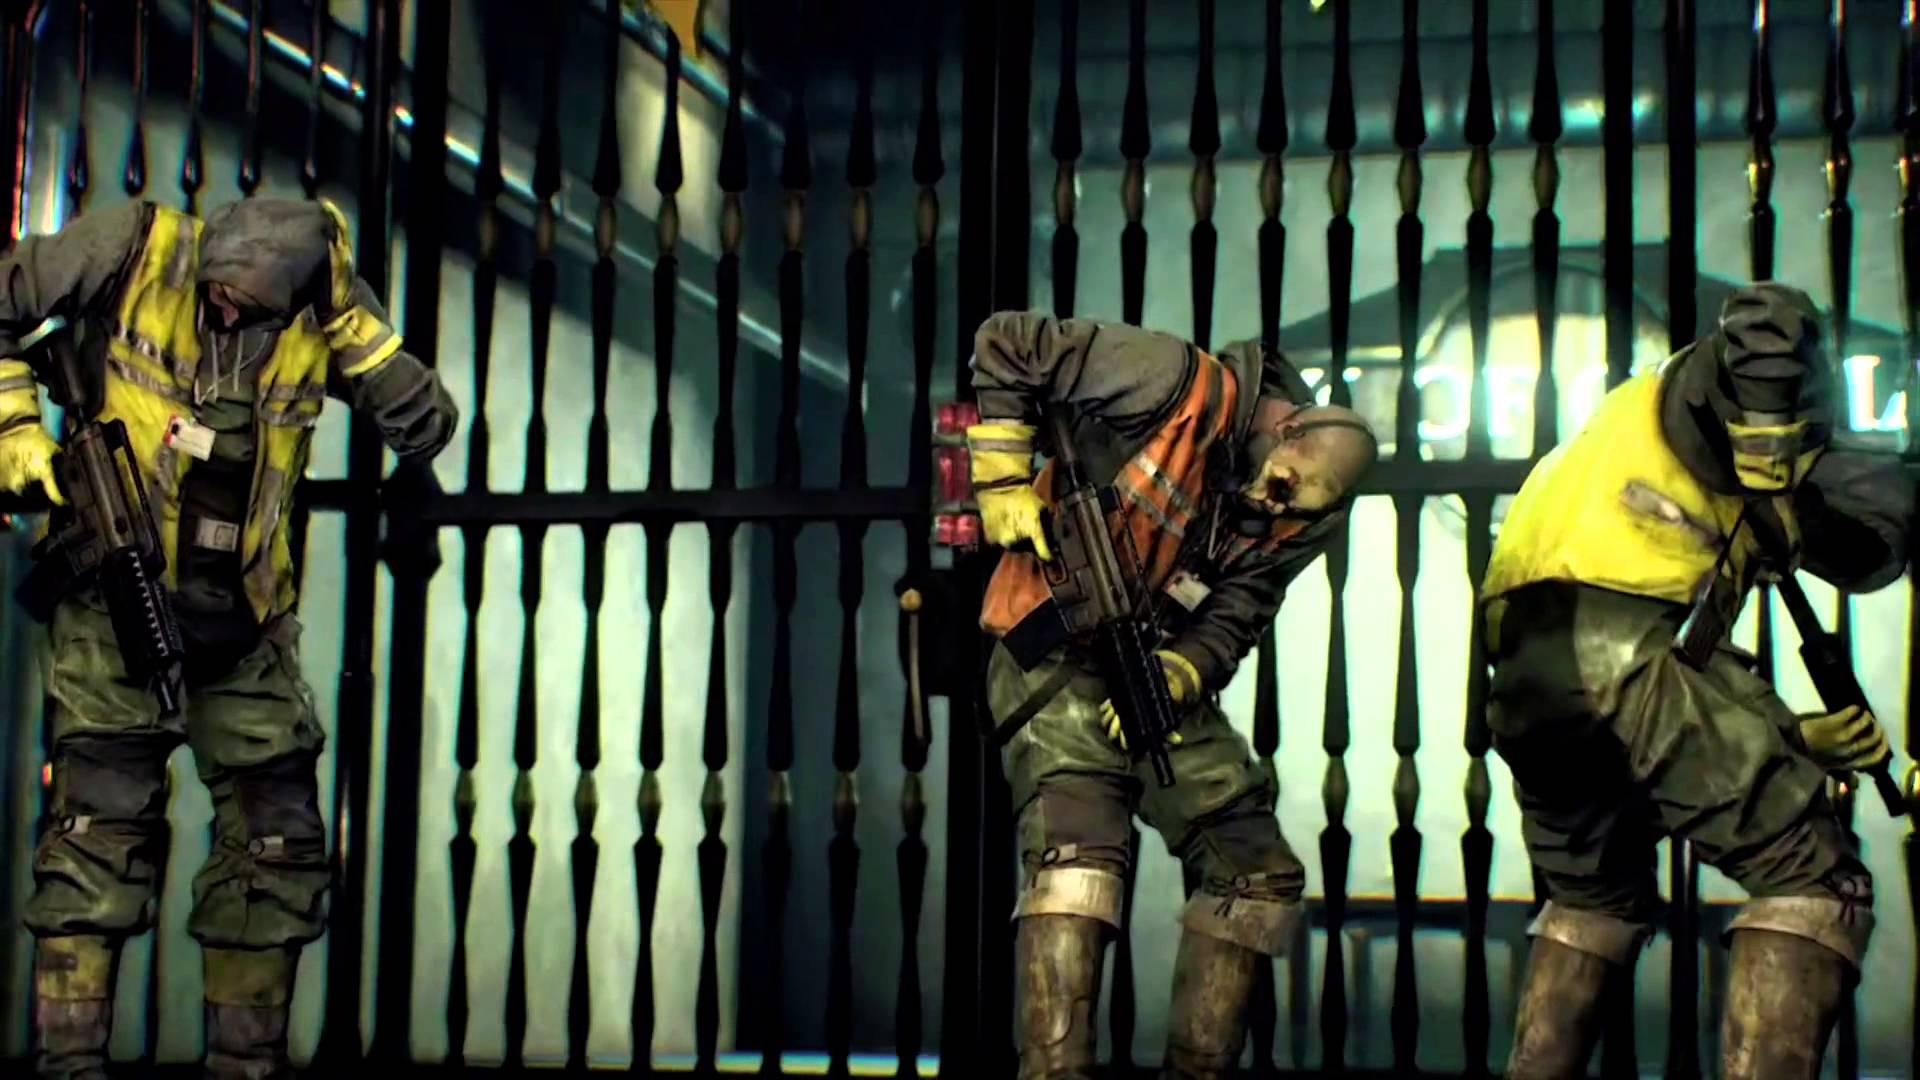 E3 2015: Trailer-Sammlung mit Batman, Fallout 4, Tomb Raider uvm.